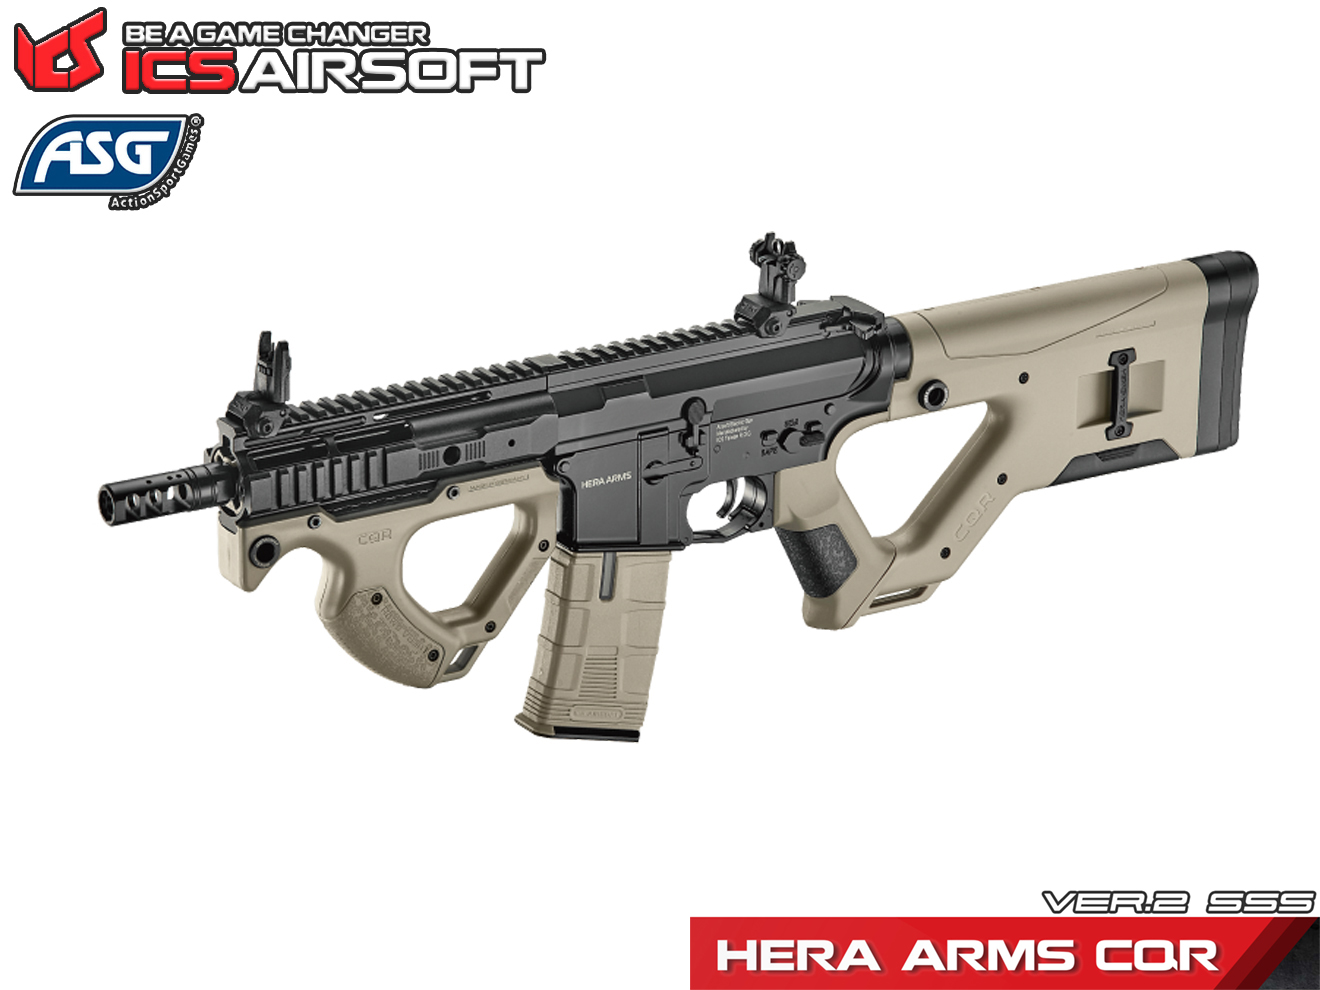 ICS×ASG HERA ARMS CQR AEG Two-Tone Ver.2 SSS+EBB JP Ver. ◆HERA ARMS正規ライセンス取得 電動ガン ツートン バージョン2 タンカラー